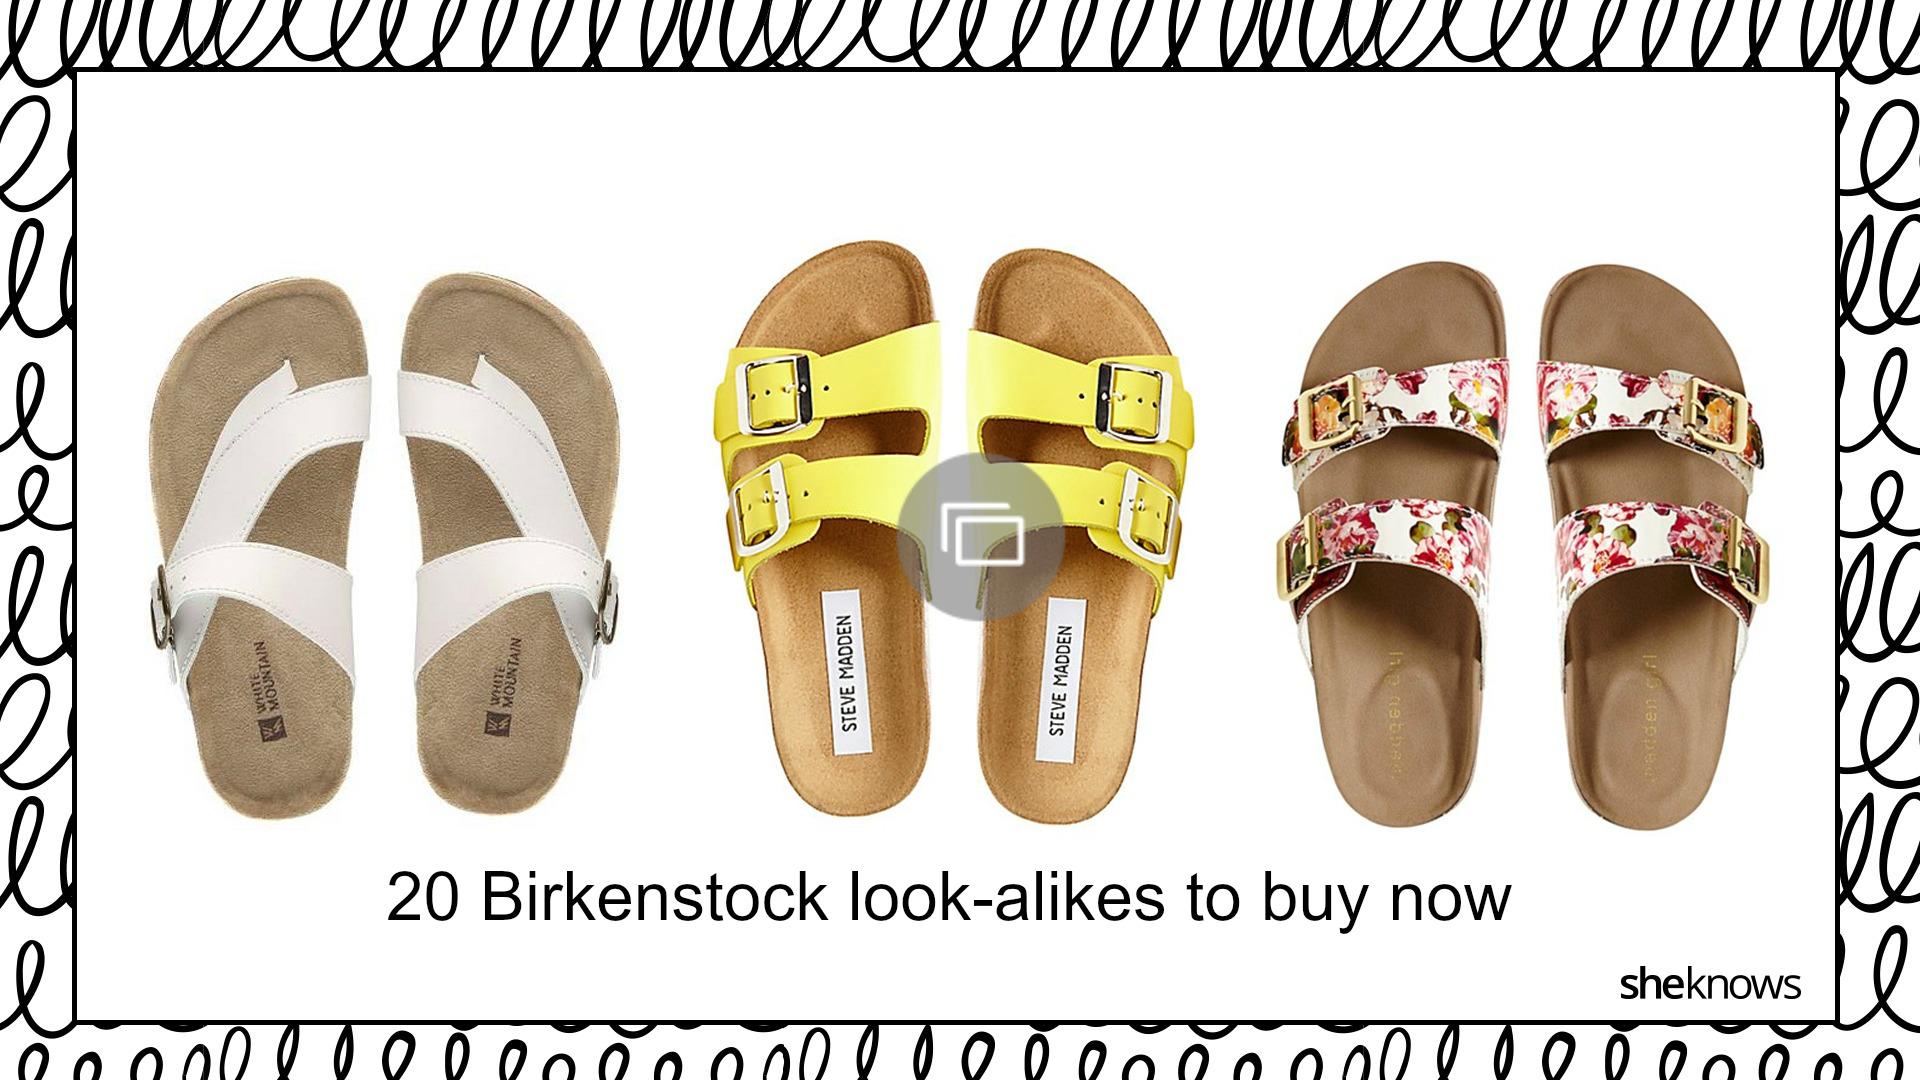 Birkenstocks look-alikes for fashionistas